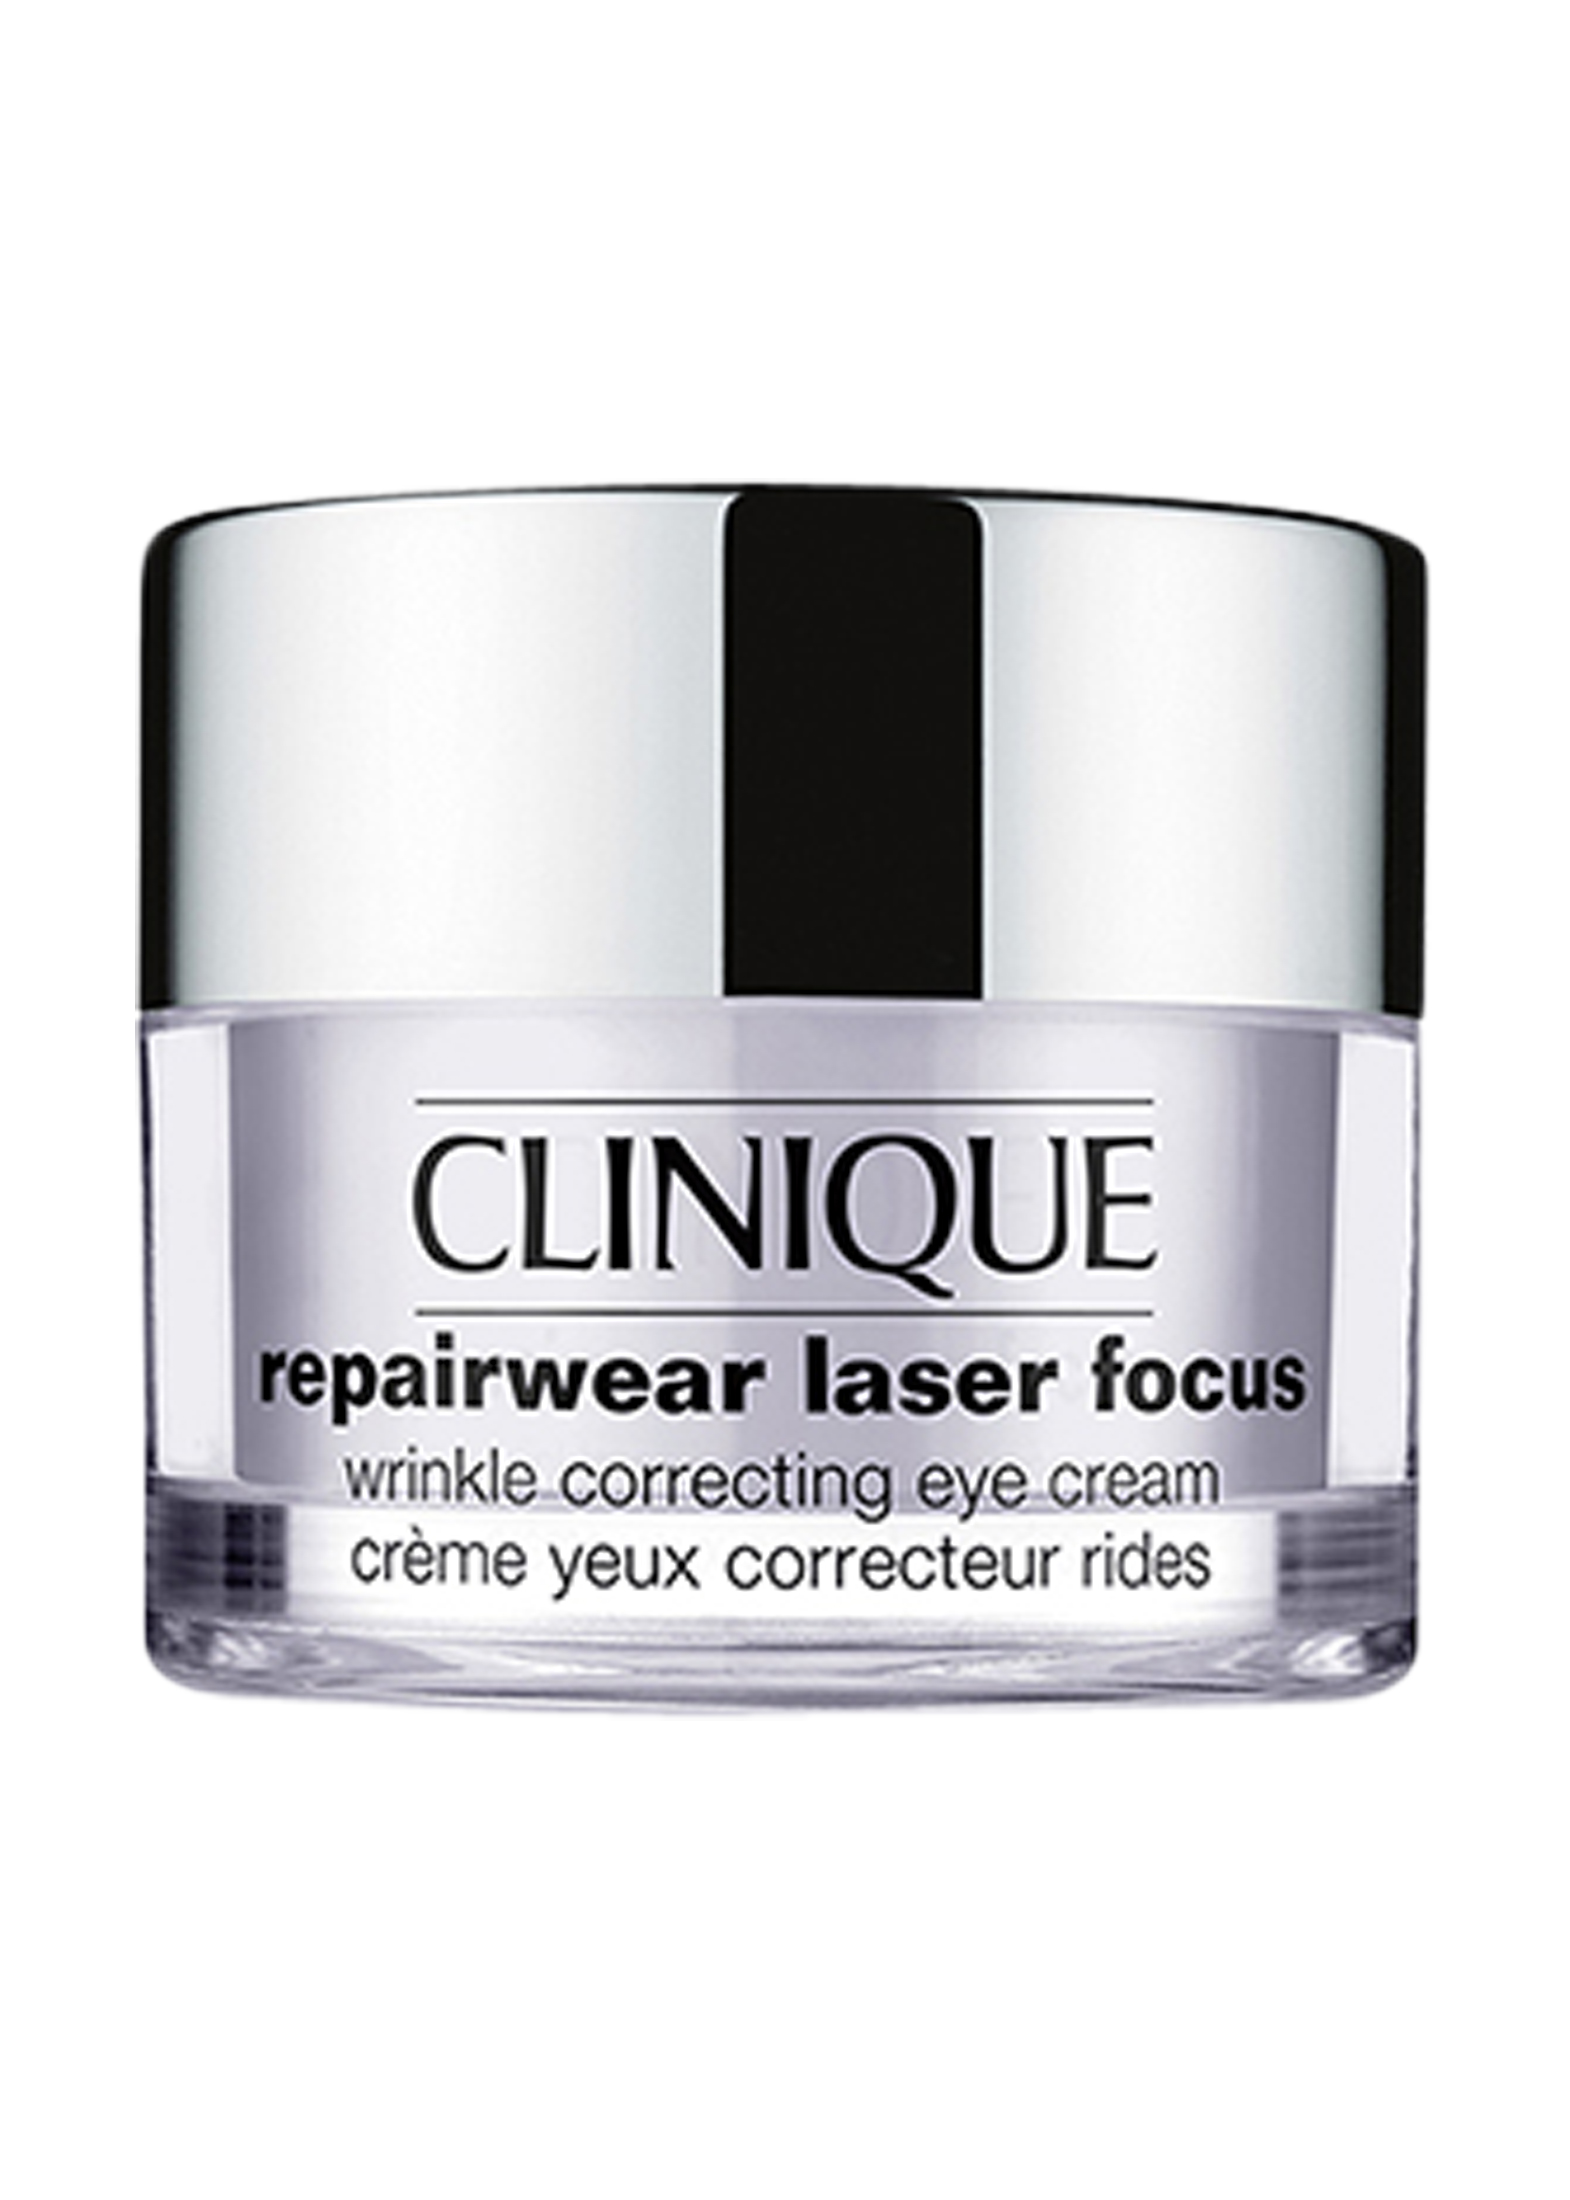 CLINIQUE, RWLF Wrinkle Correcting Eye Cream 15ML image number 0